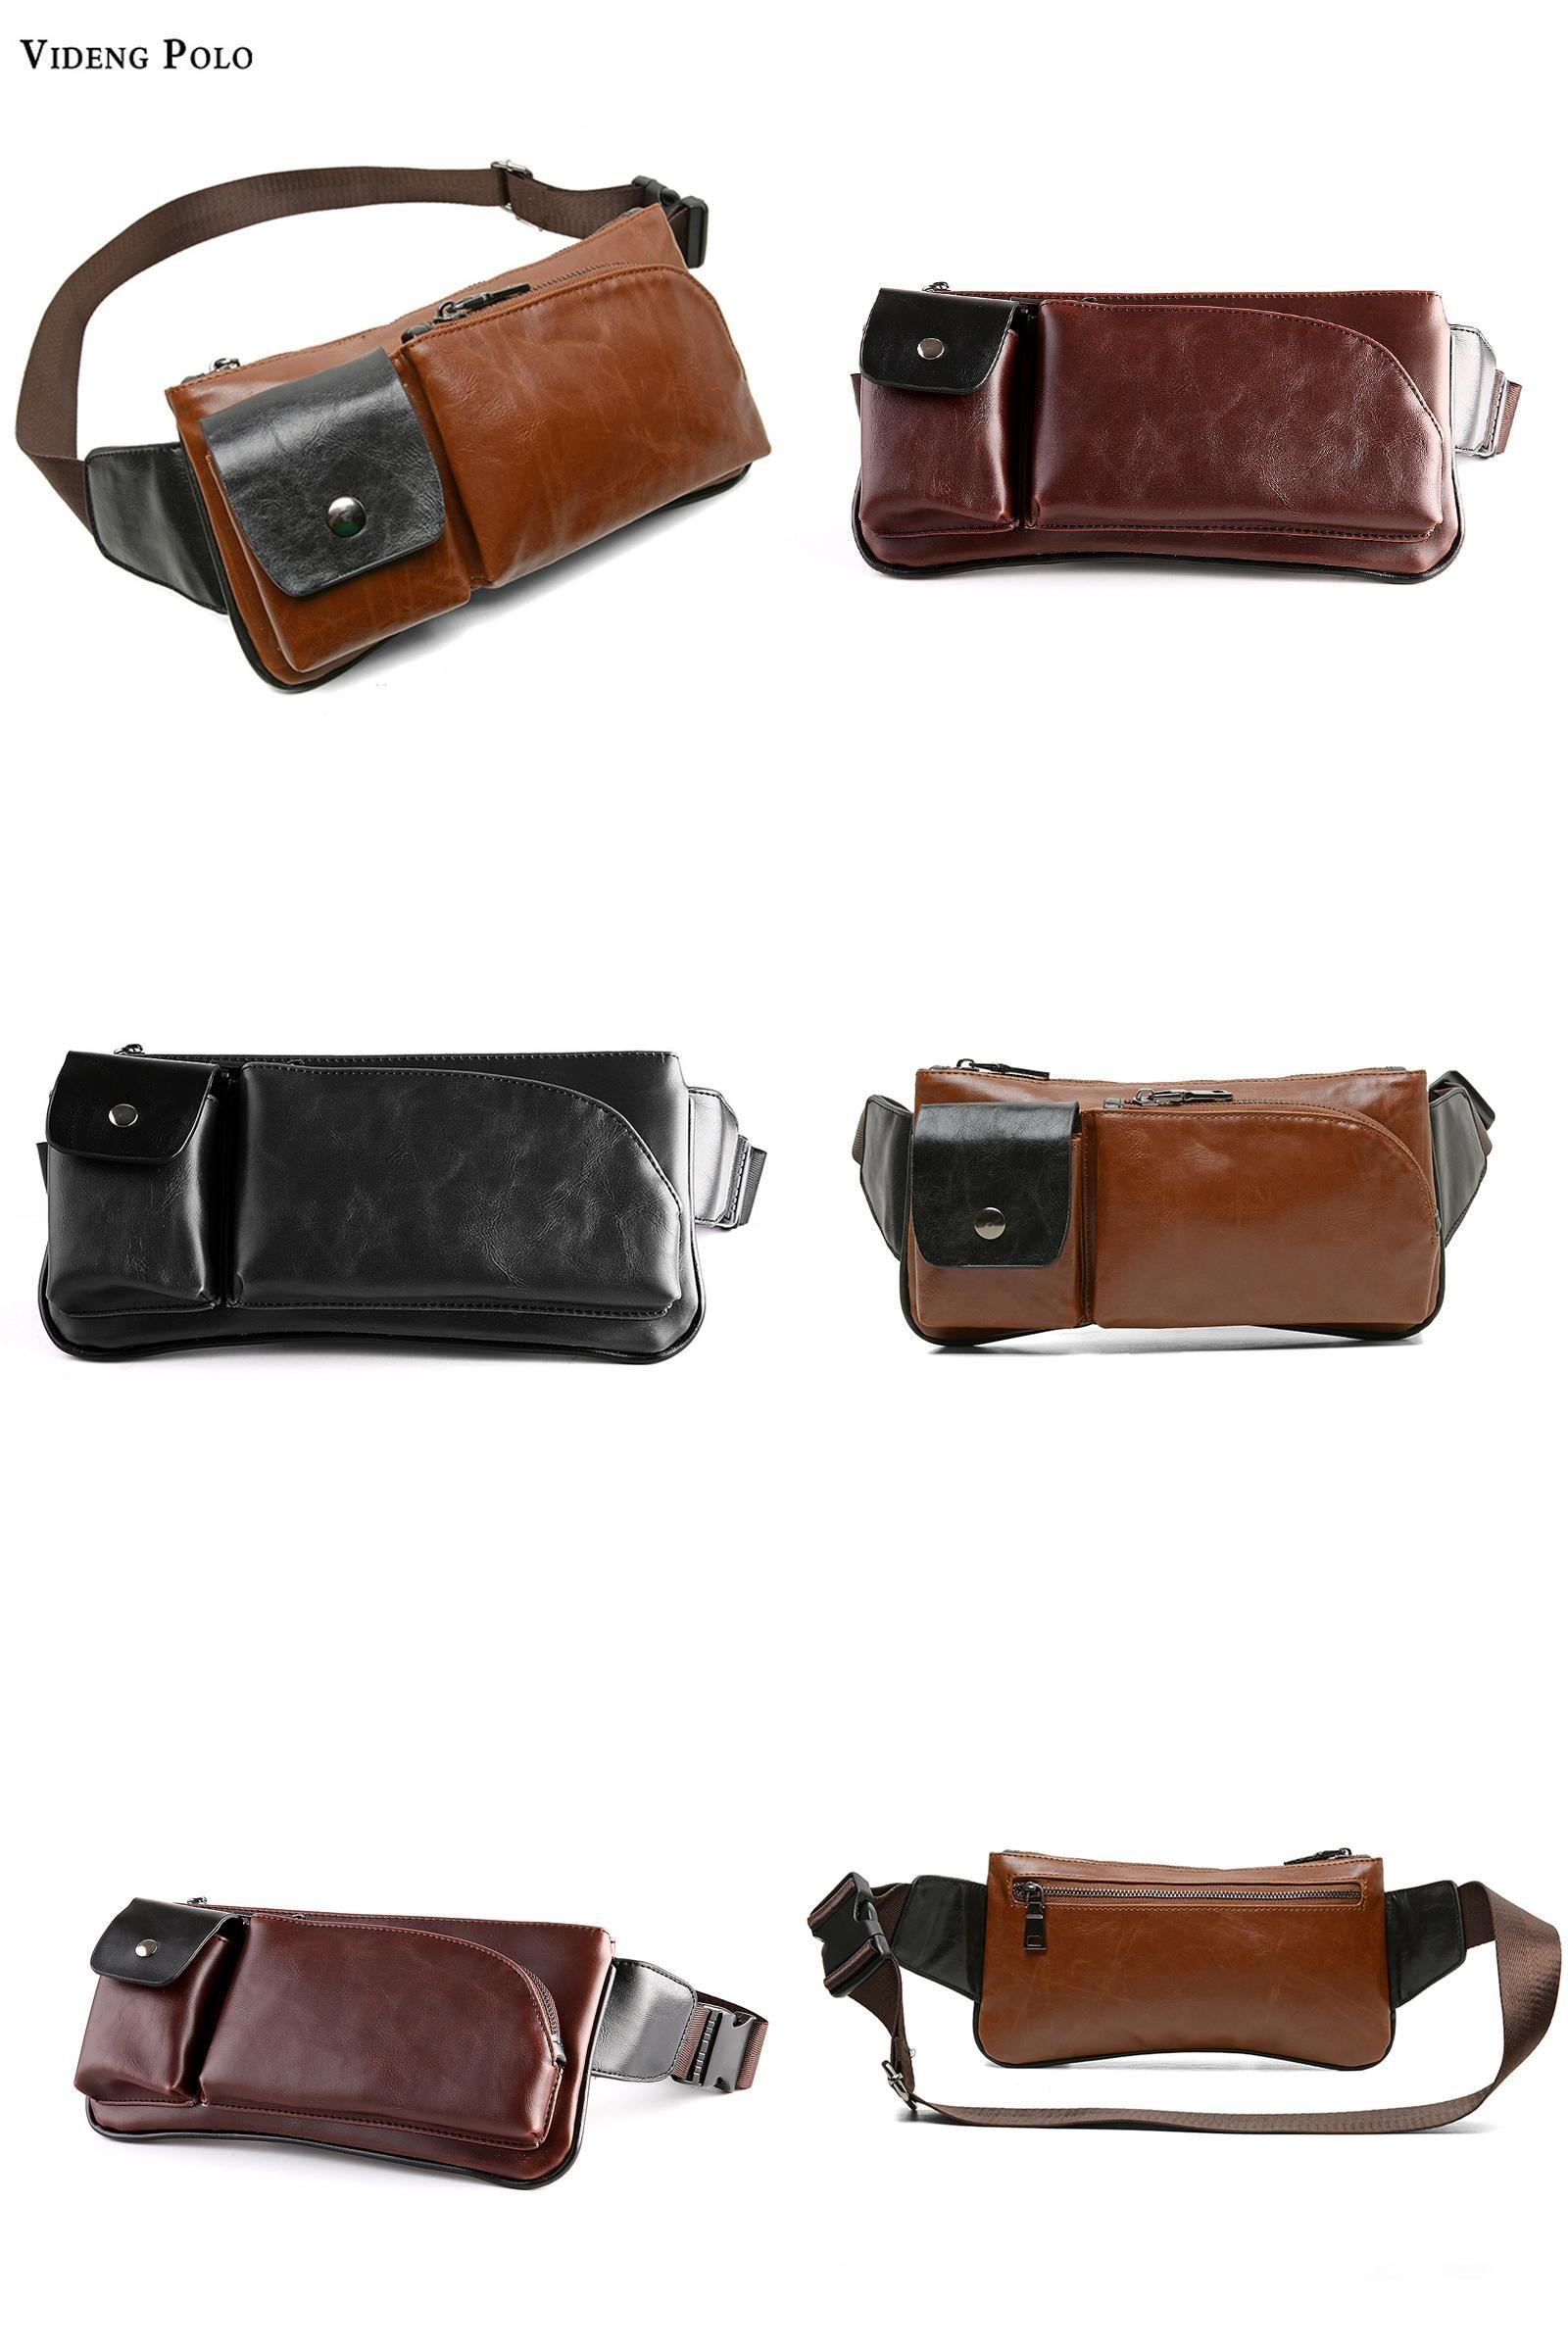 4a110c95c70 ... Mens Bag  more photos 289e9 2983e Visit to Buy VIDENG POLO Men Chest Bag  Brand New Vintage Leather ...